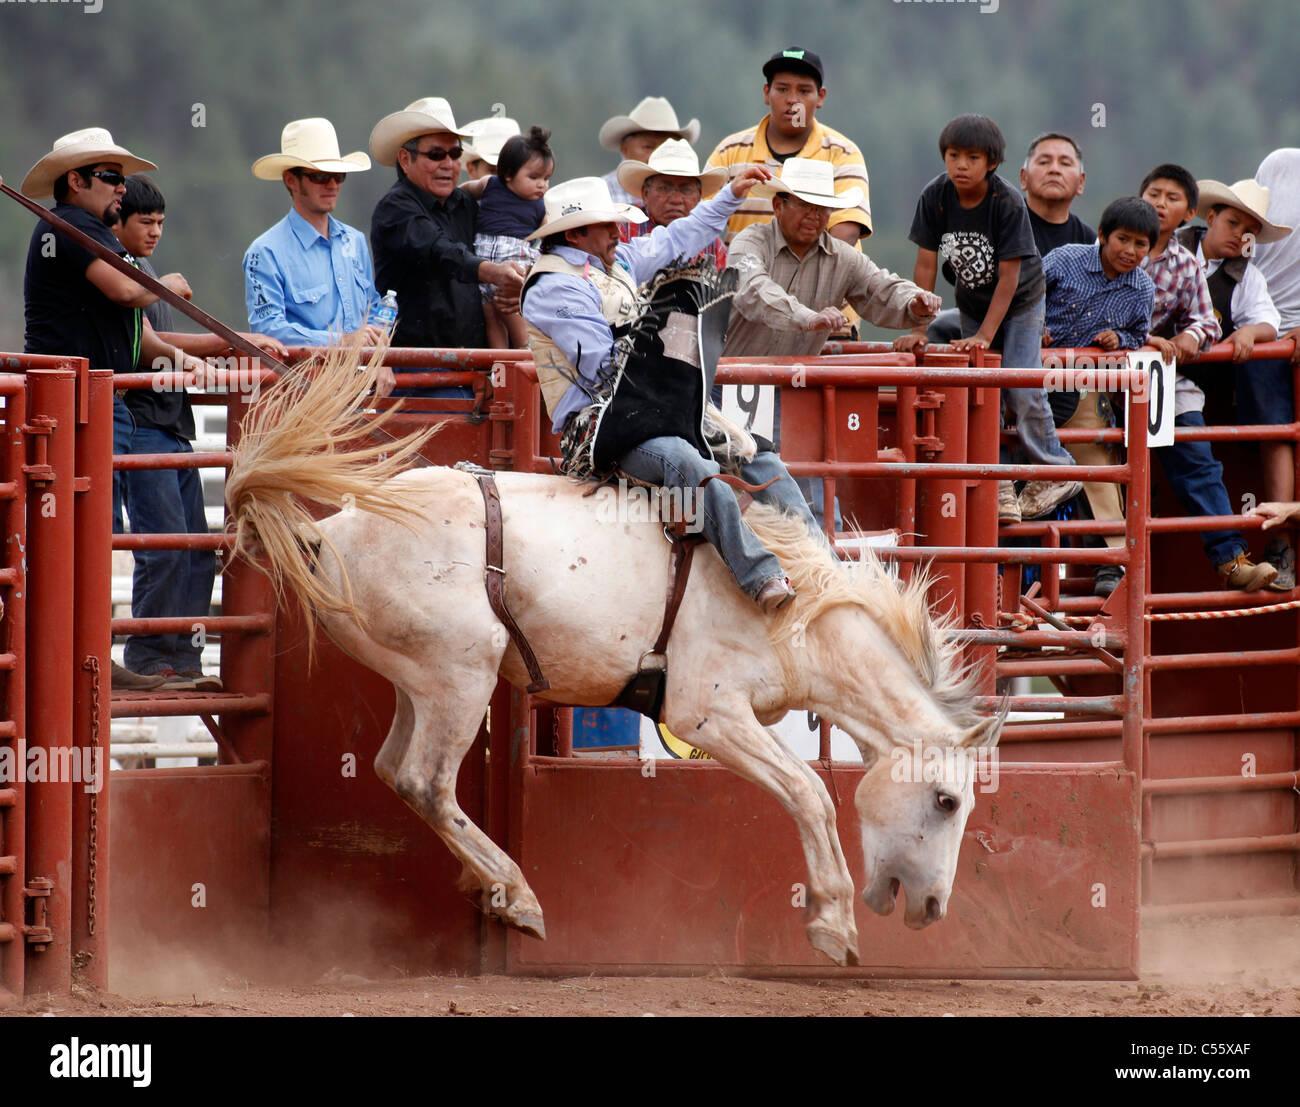 Mescalero Stock Photos & Mescalero Stock Images - Alamy